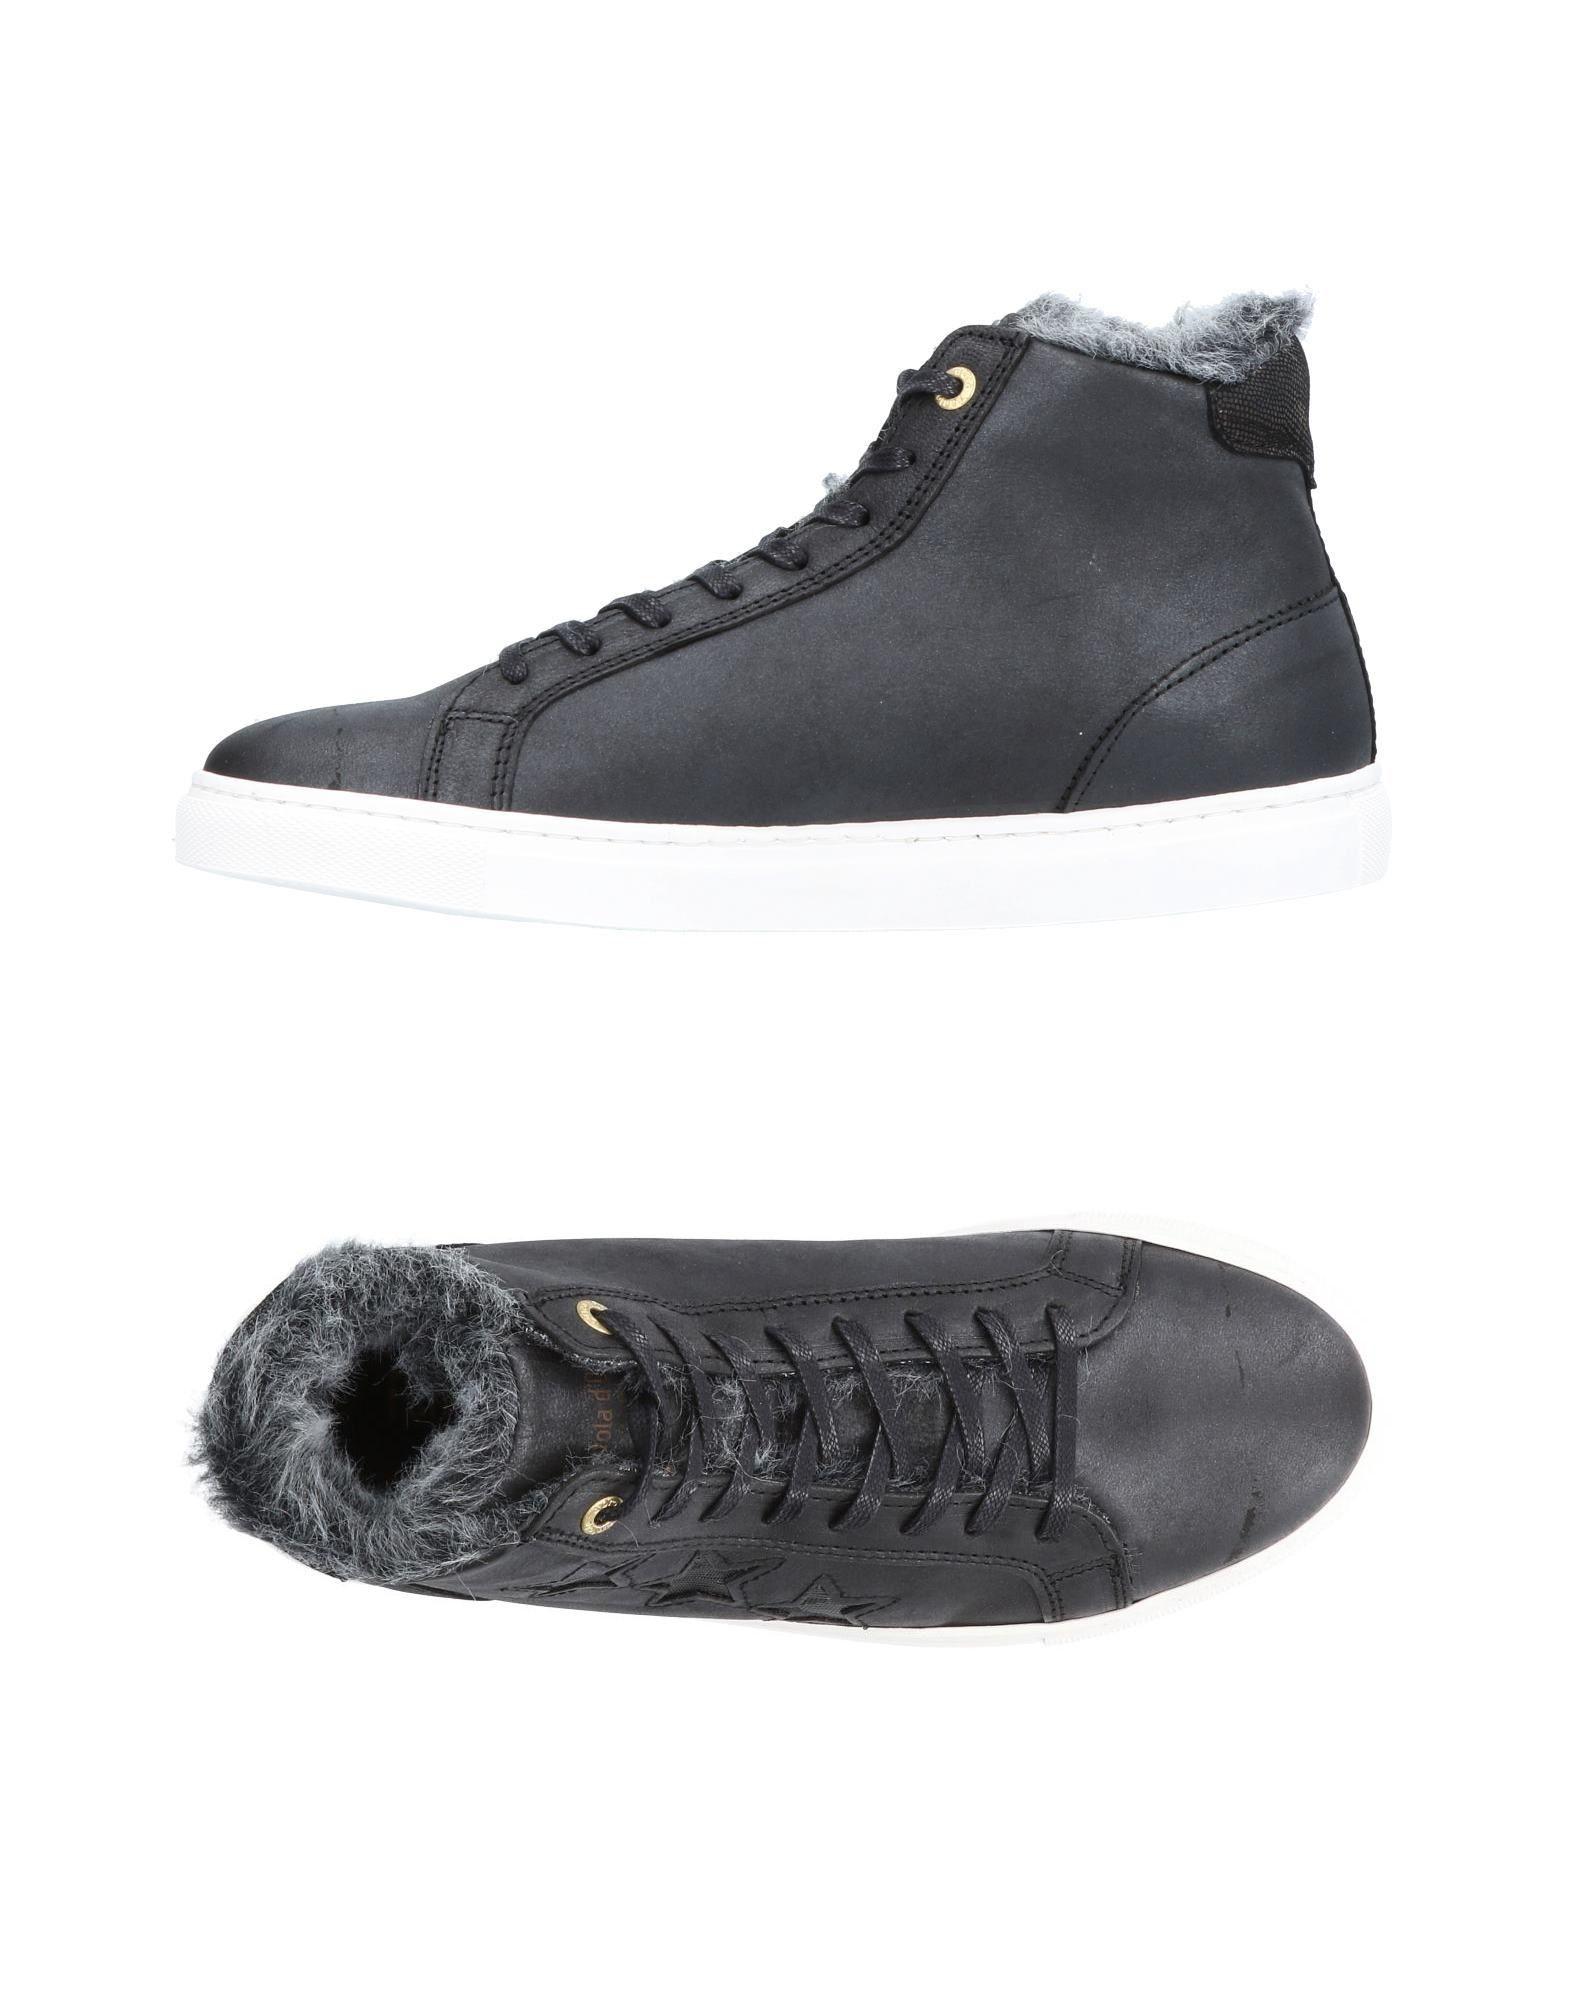 Pantofola D'oro Sneakers Damen  11456377DL Gute Qualität beliebte Schuhe